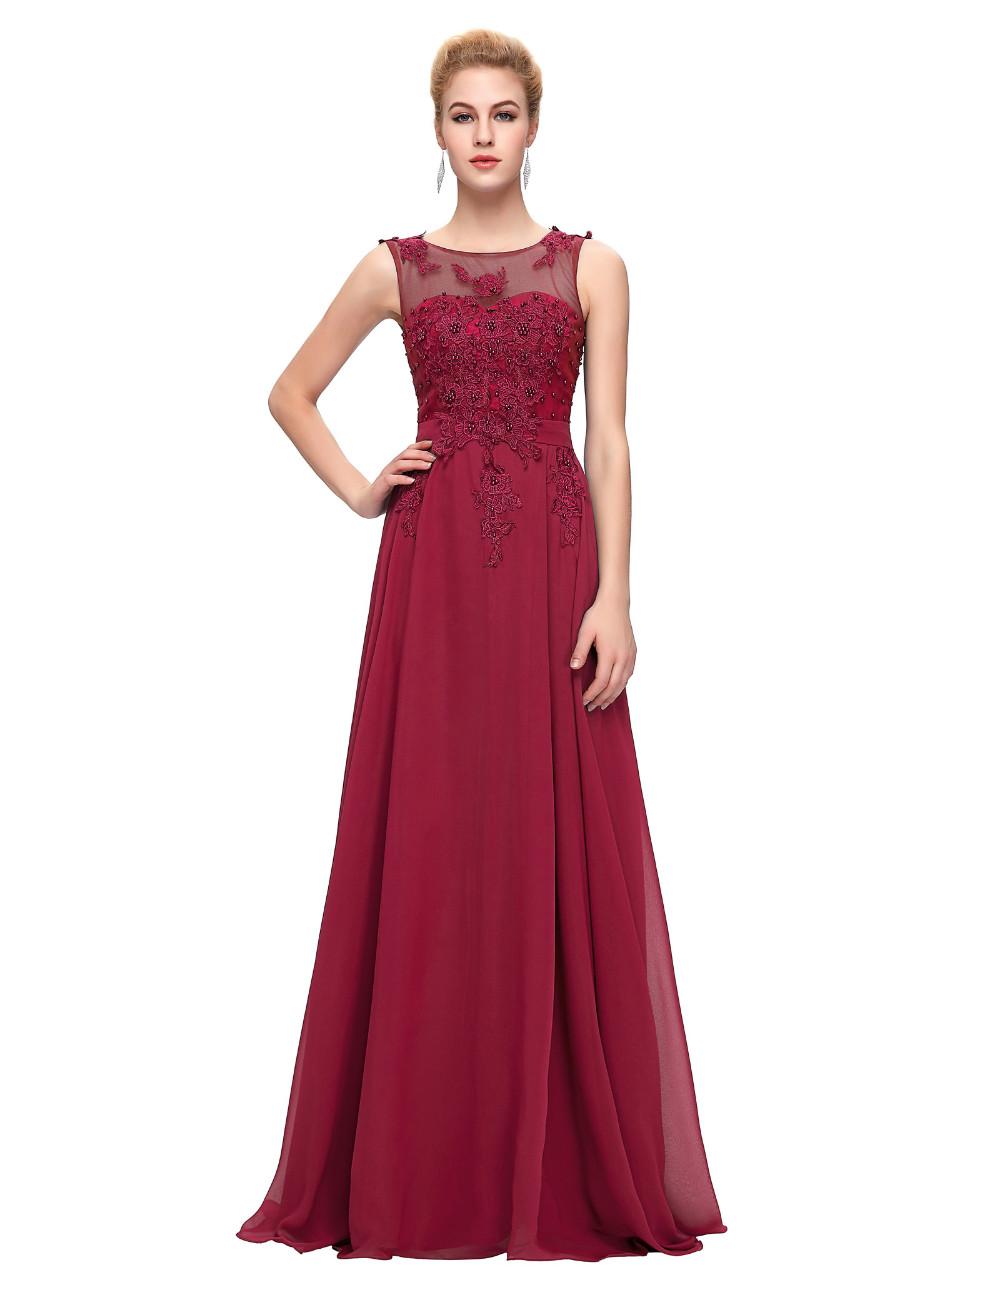 Grace Karin Elegant Long Evening Dresses 2016 Chiffon Pink Purple Red Royal Blue Black Formal Evening Dress Gown Abendkleider 53